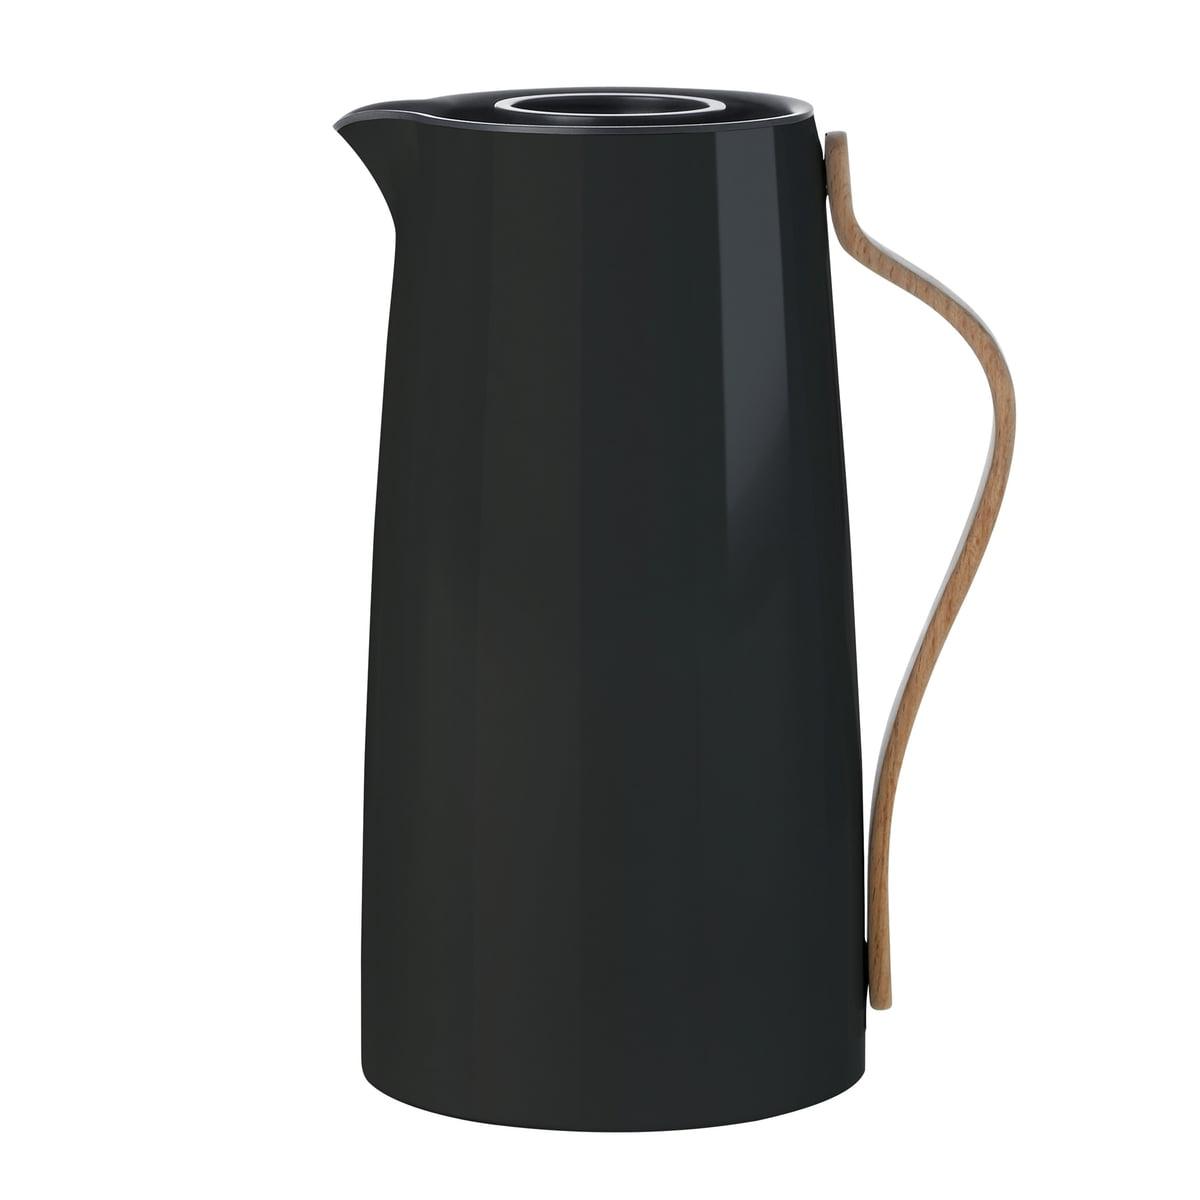 stelton emma kaffee isolierkanne im shop. Black Bedroom Furniture Sets. Home Design Ideas